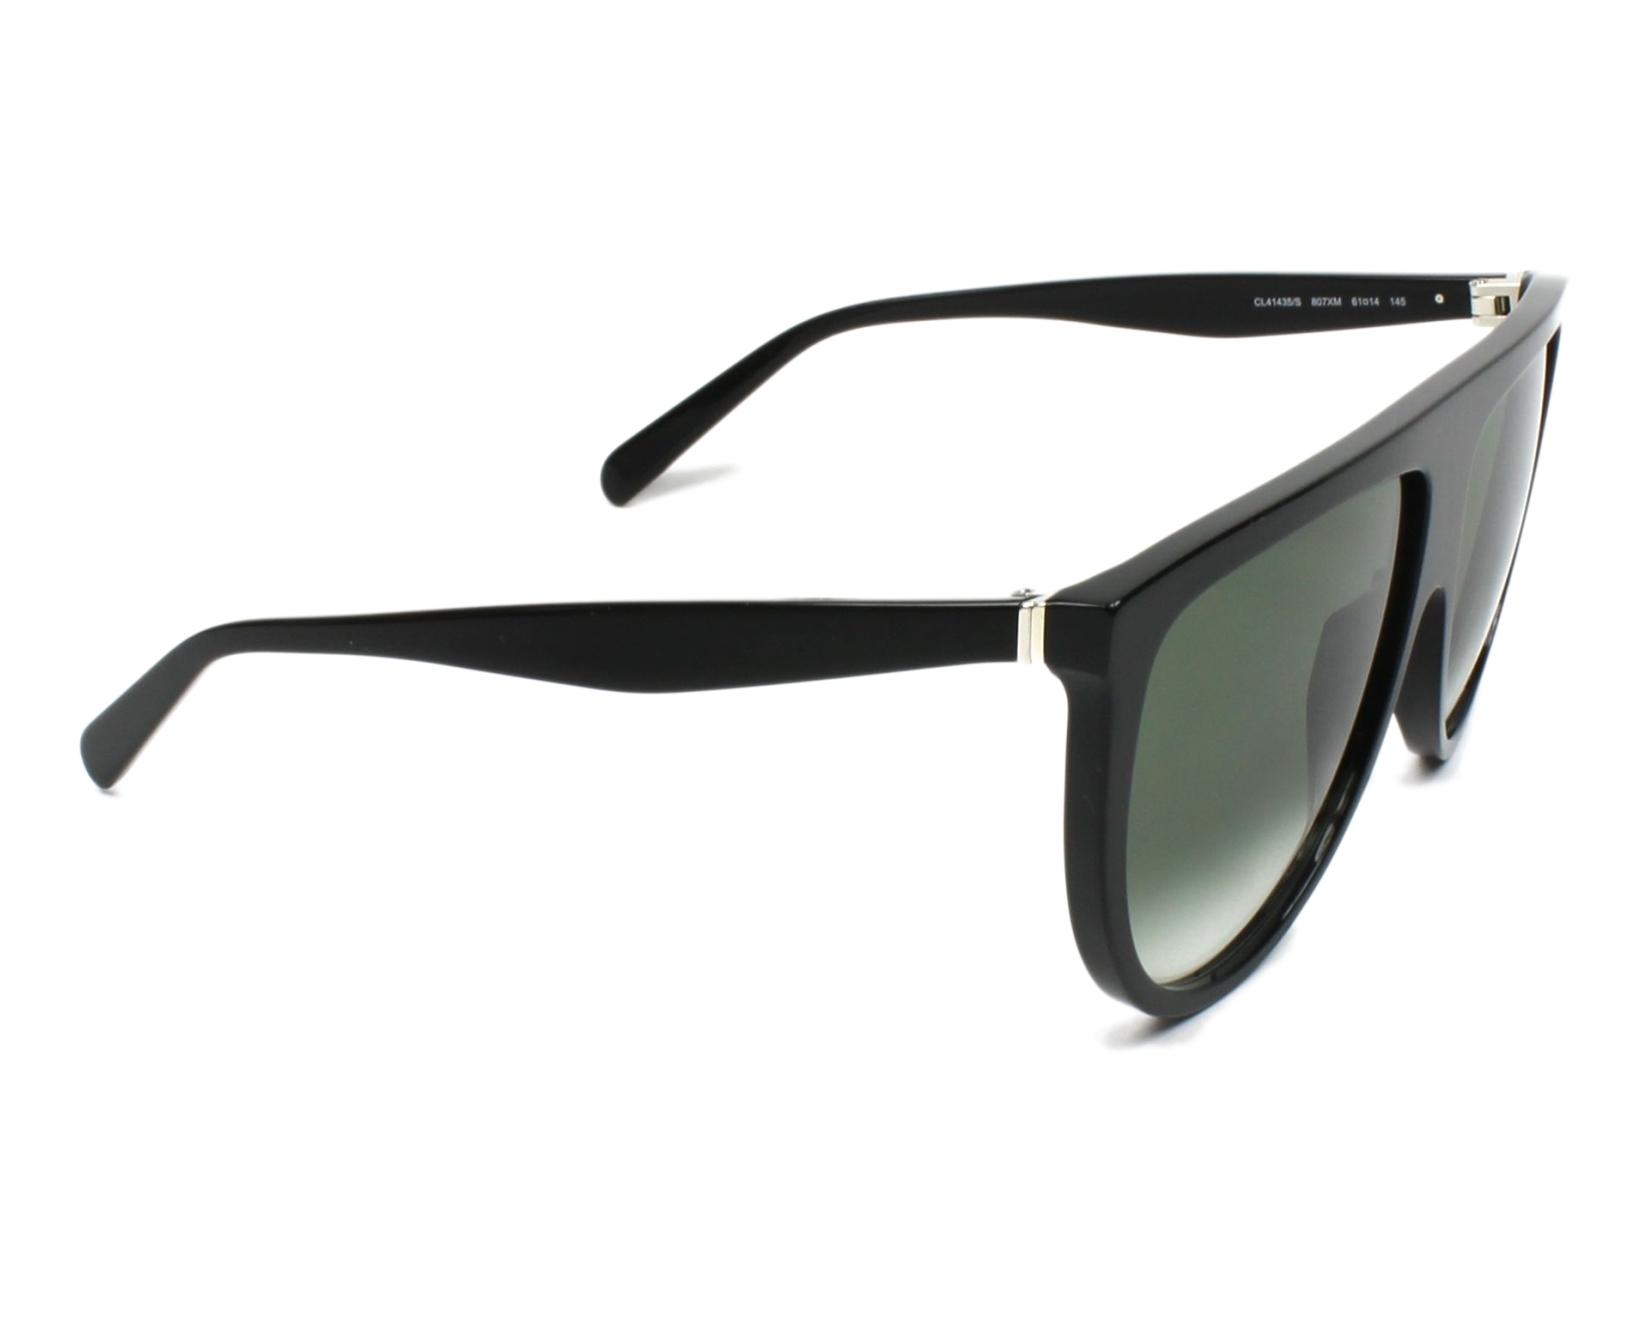 bf5b1125d052 thumbnail Sunglasses Céline CL-41435-S 807 XM - Black side view